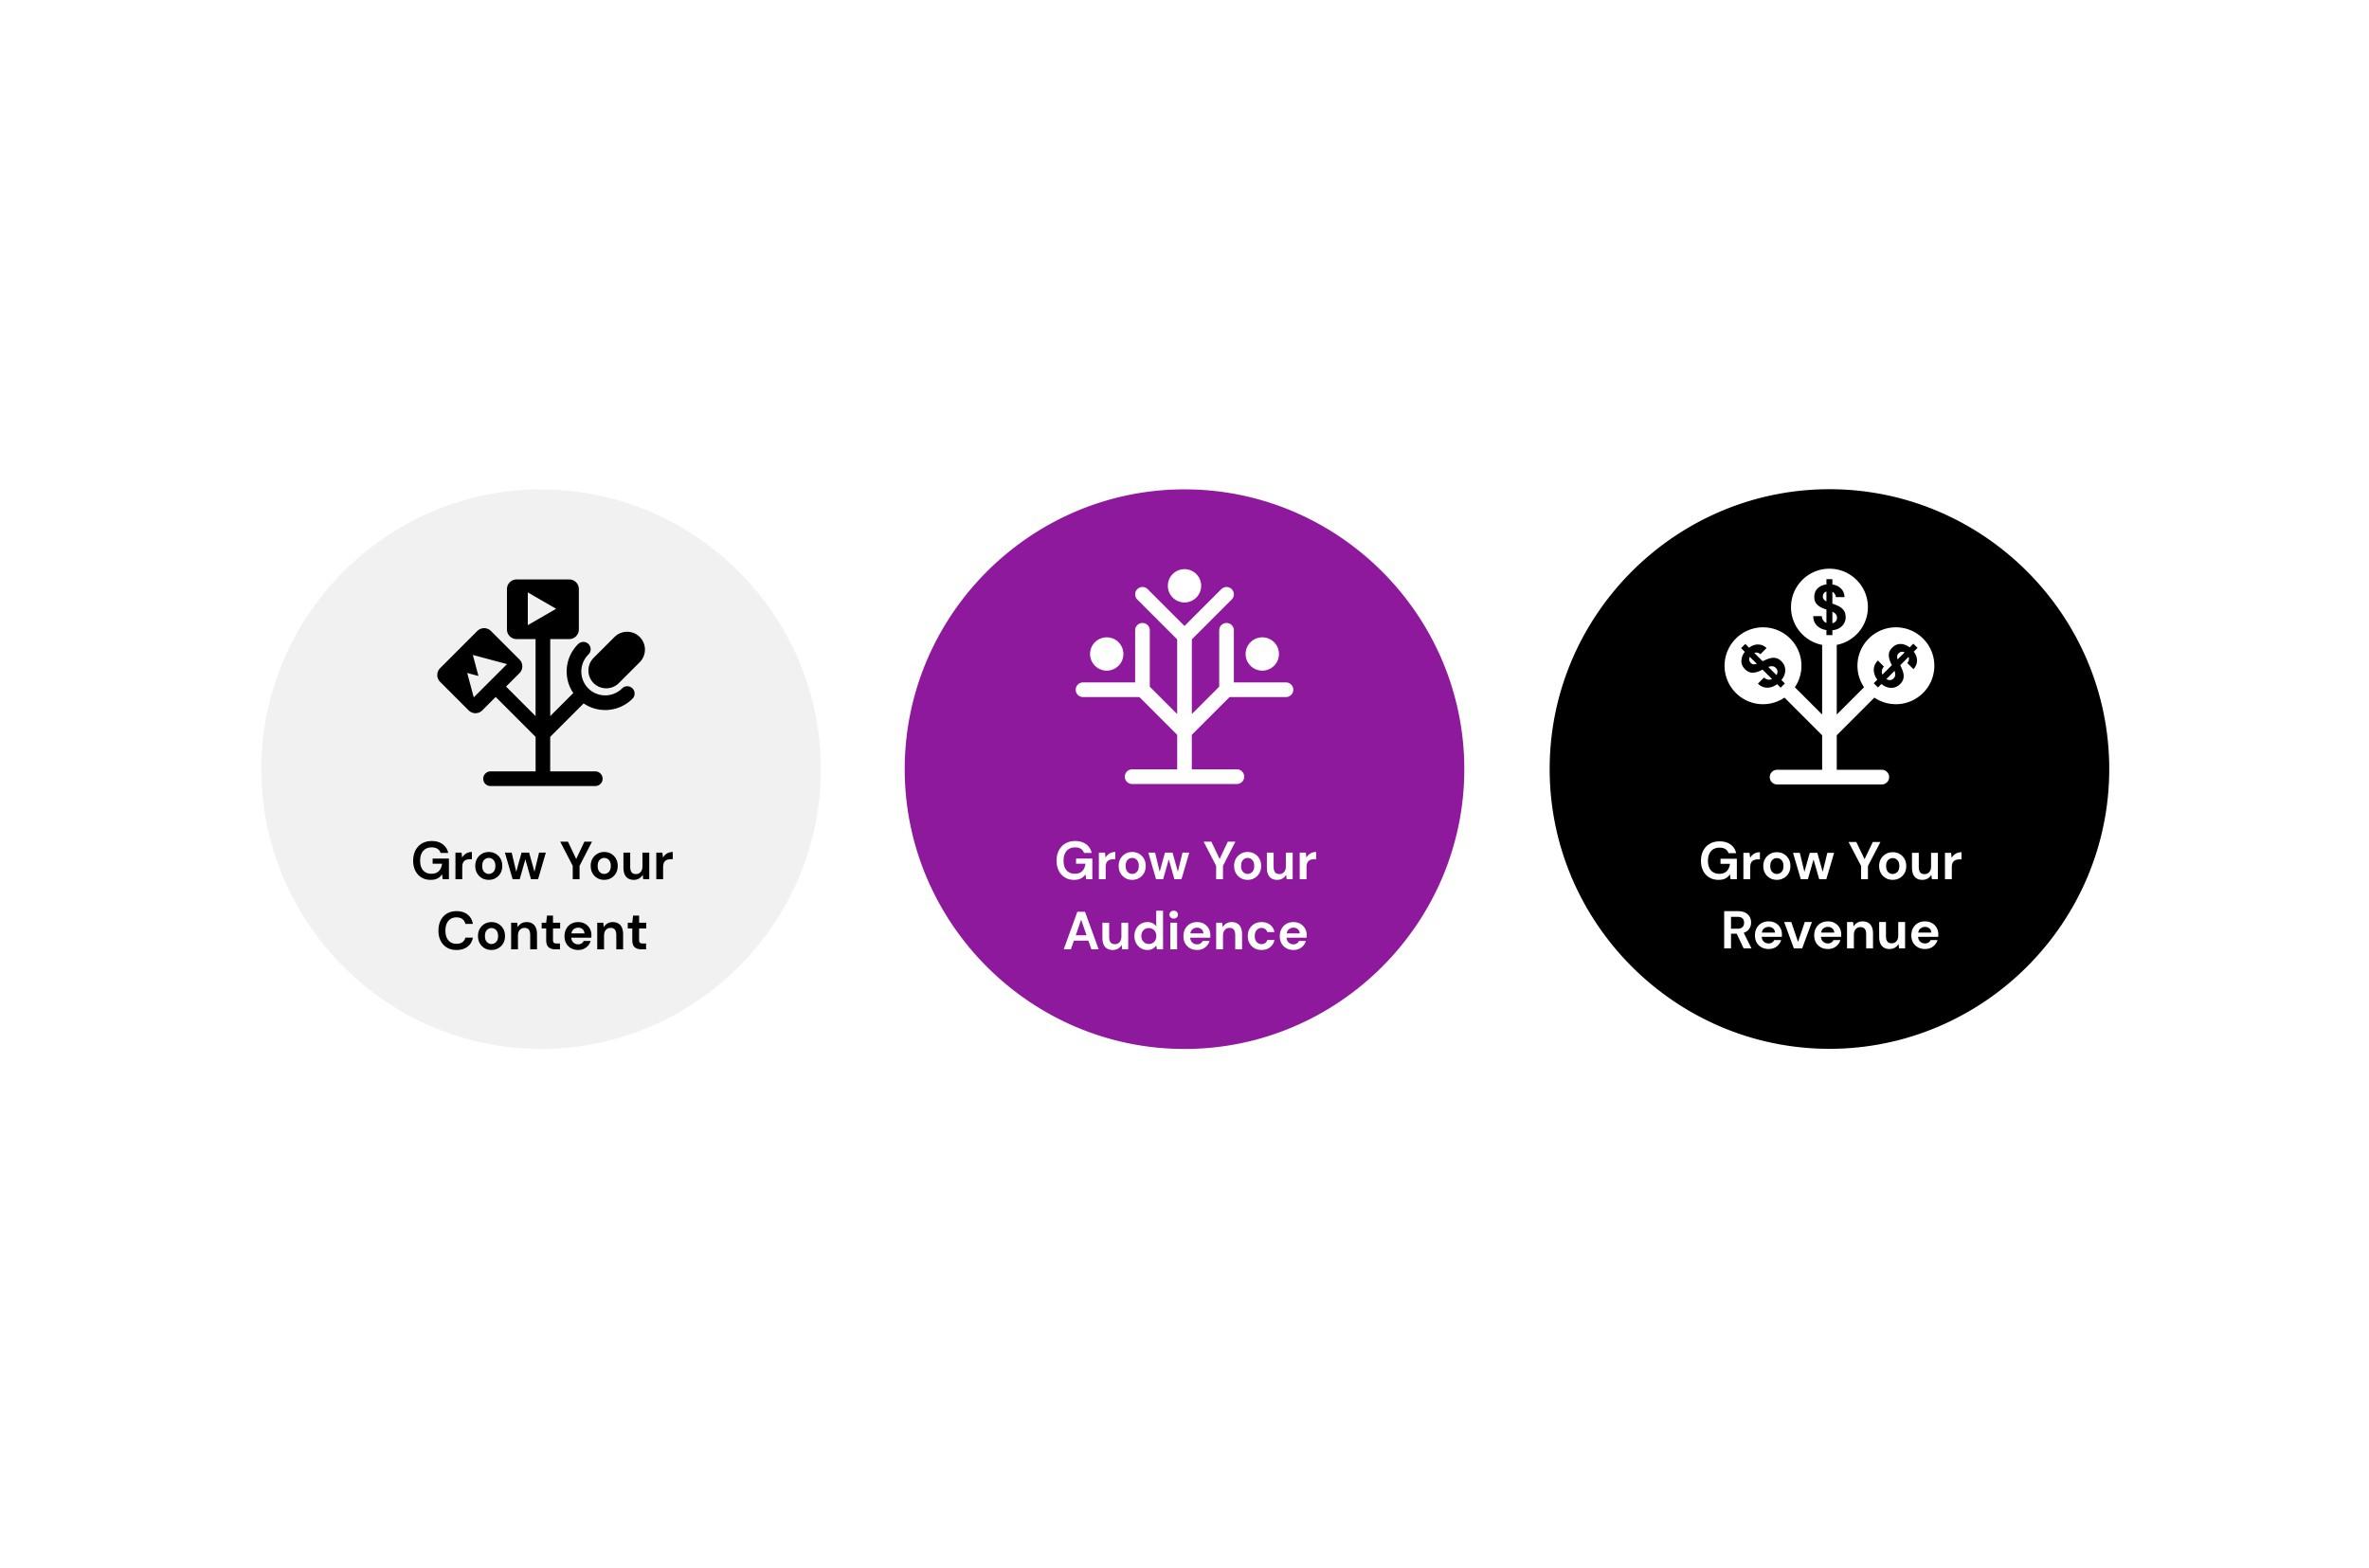 Design set of icons incorporating neuromarketing principles